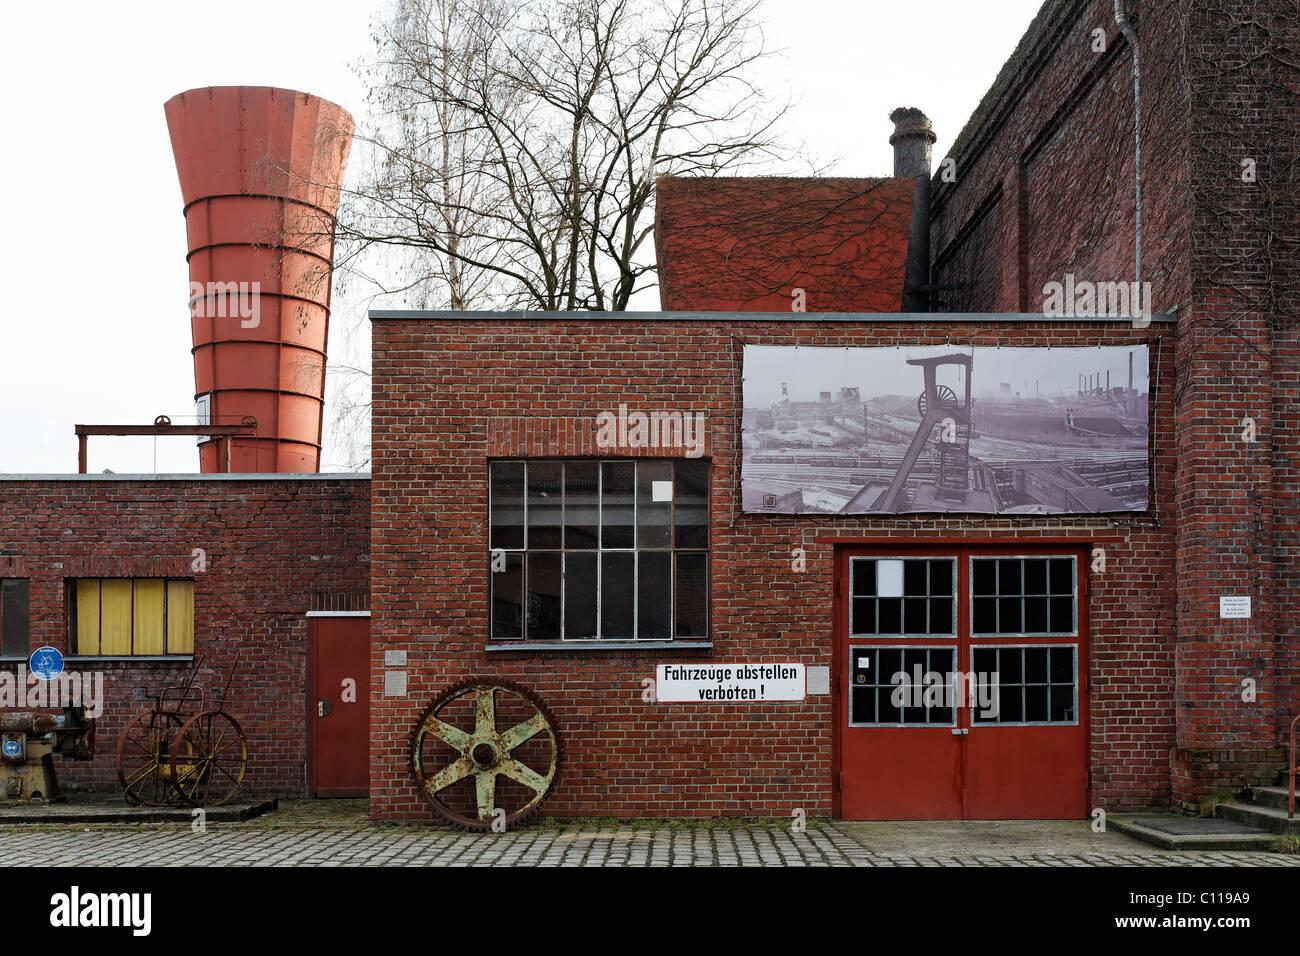 Kunstschacht Zollverein, art gallery in the former power station, shafts 1-2-8, disused mine, Zollverein Coal Mine - Stock Image